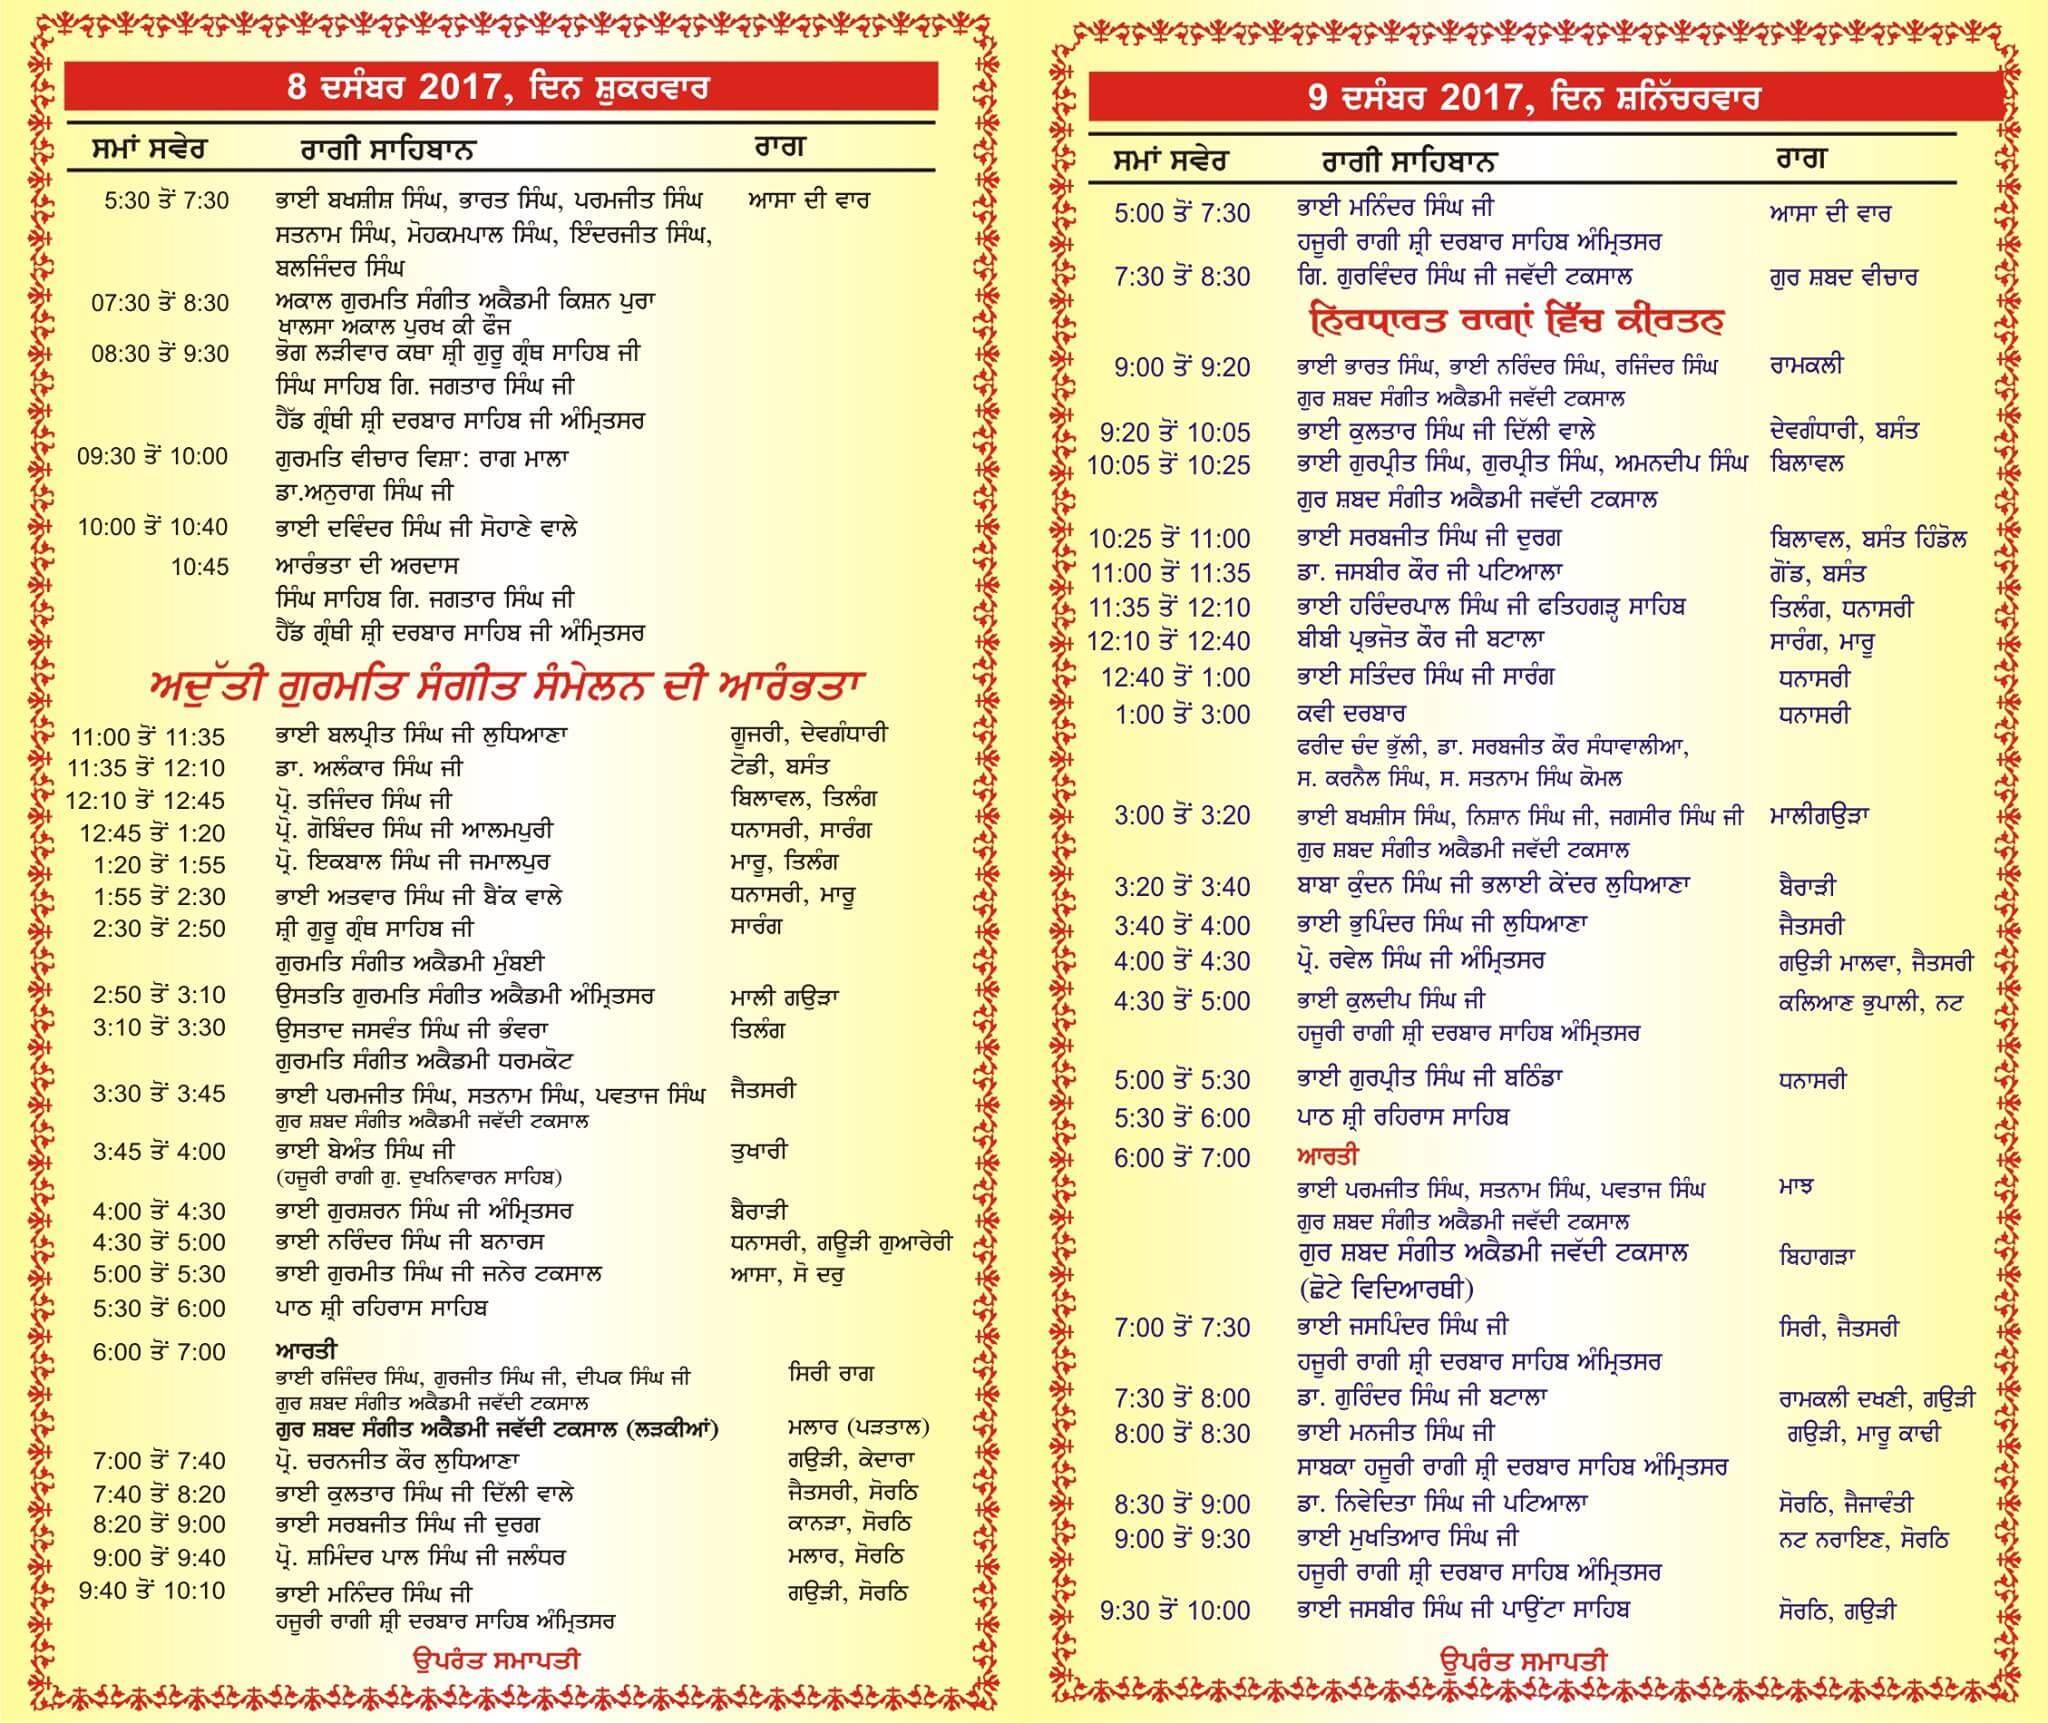 Adutti Gurmat Sangeet 2017 Time Table